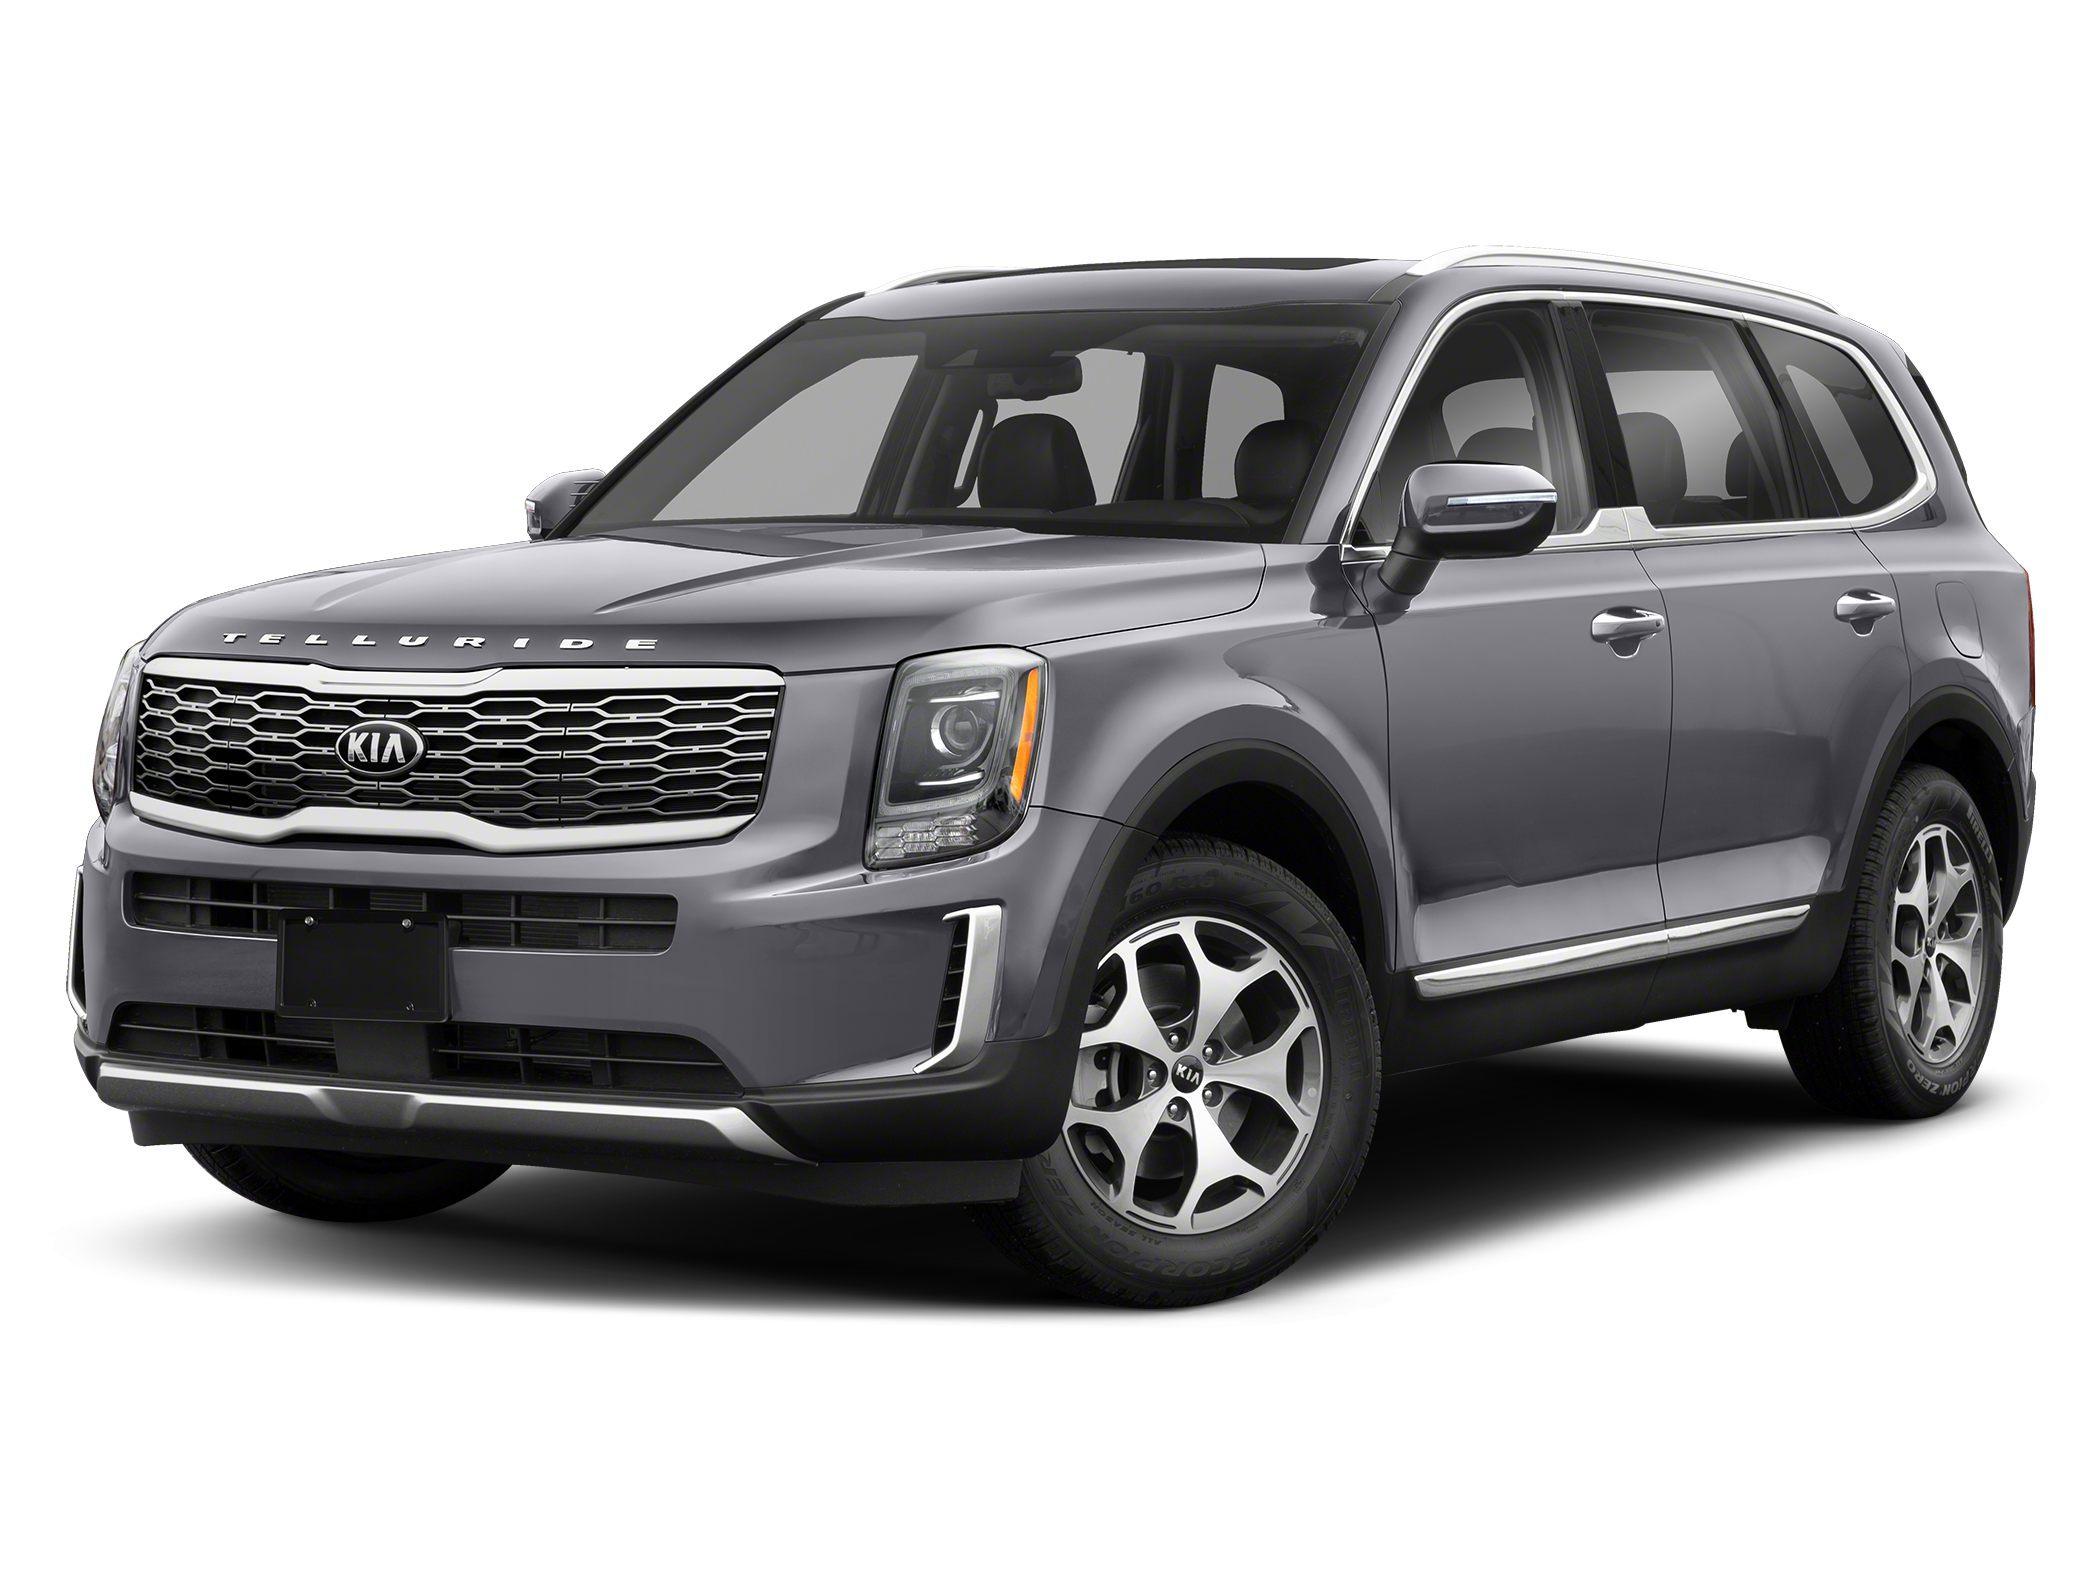 2021 Kia Telluride SUV